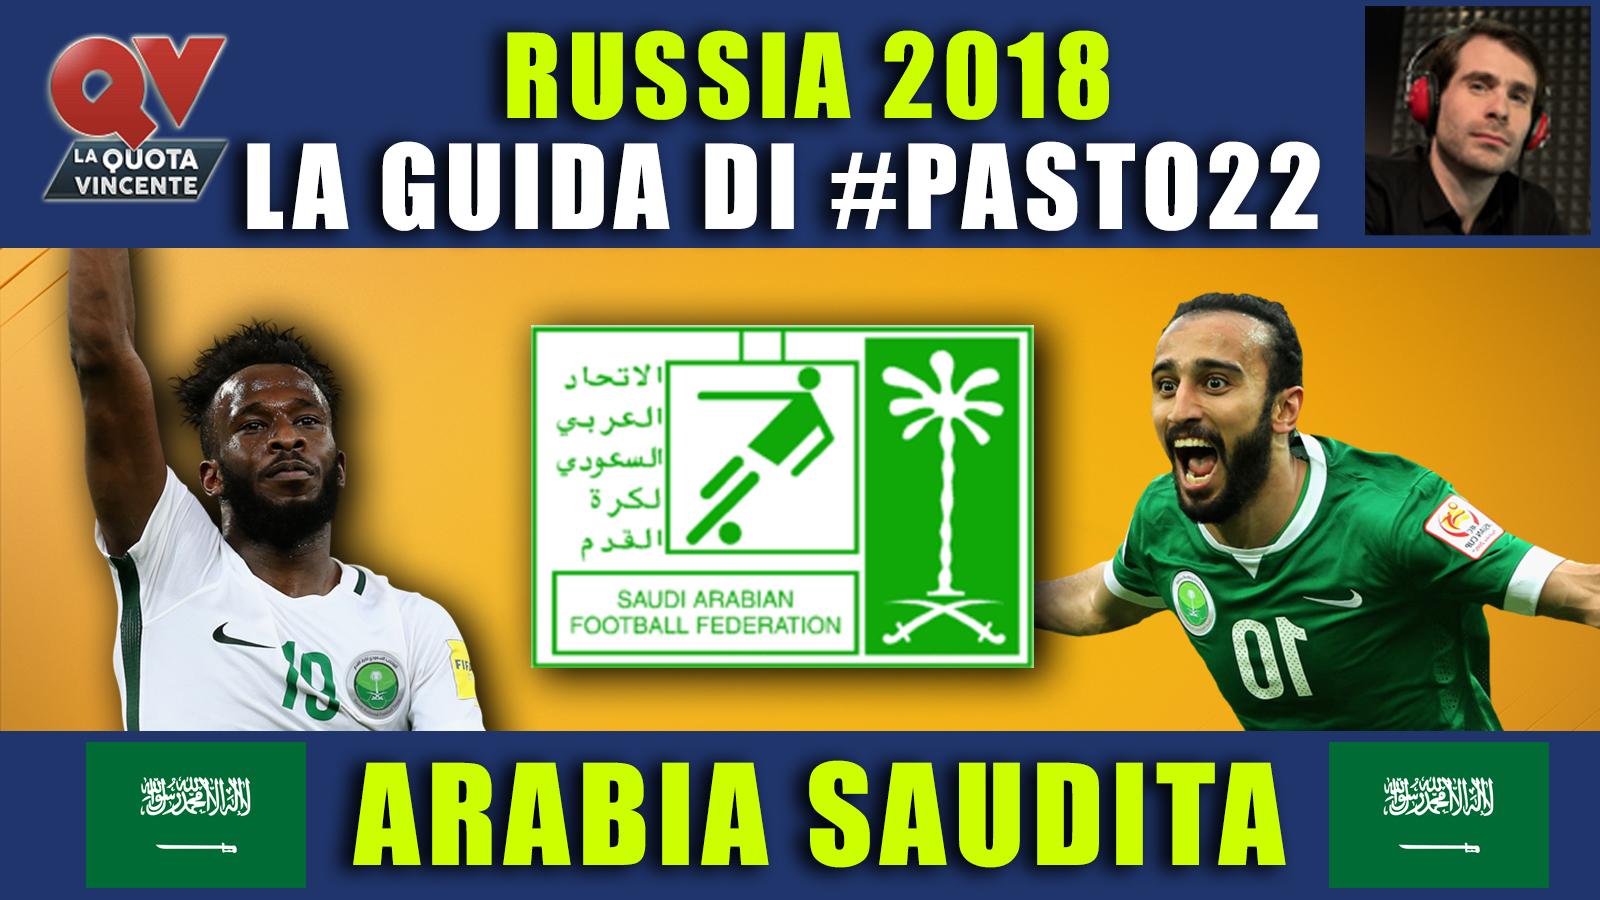 Guida Mondiali Russia 2018 Arabia Saudita